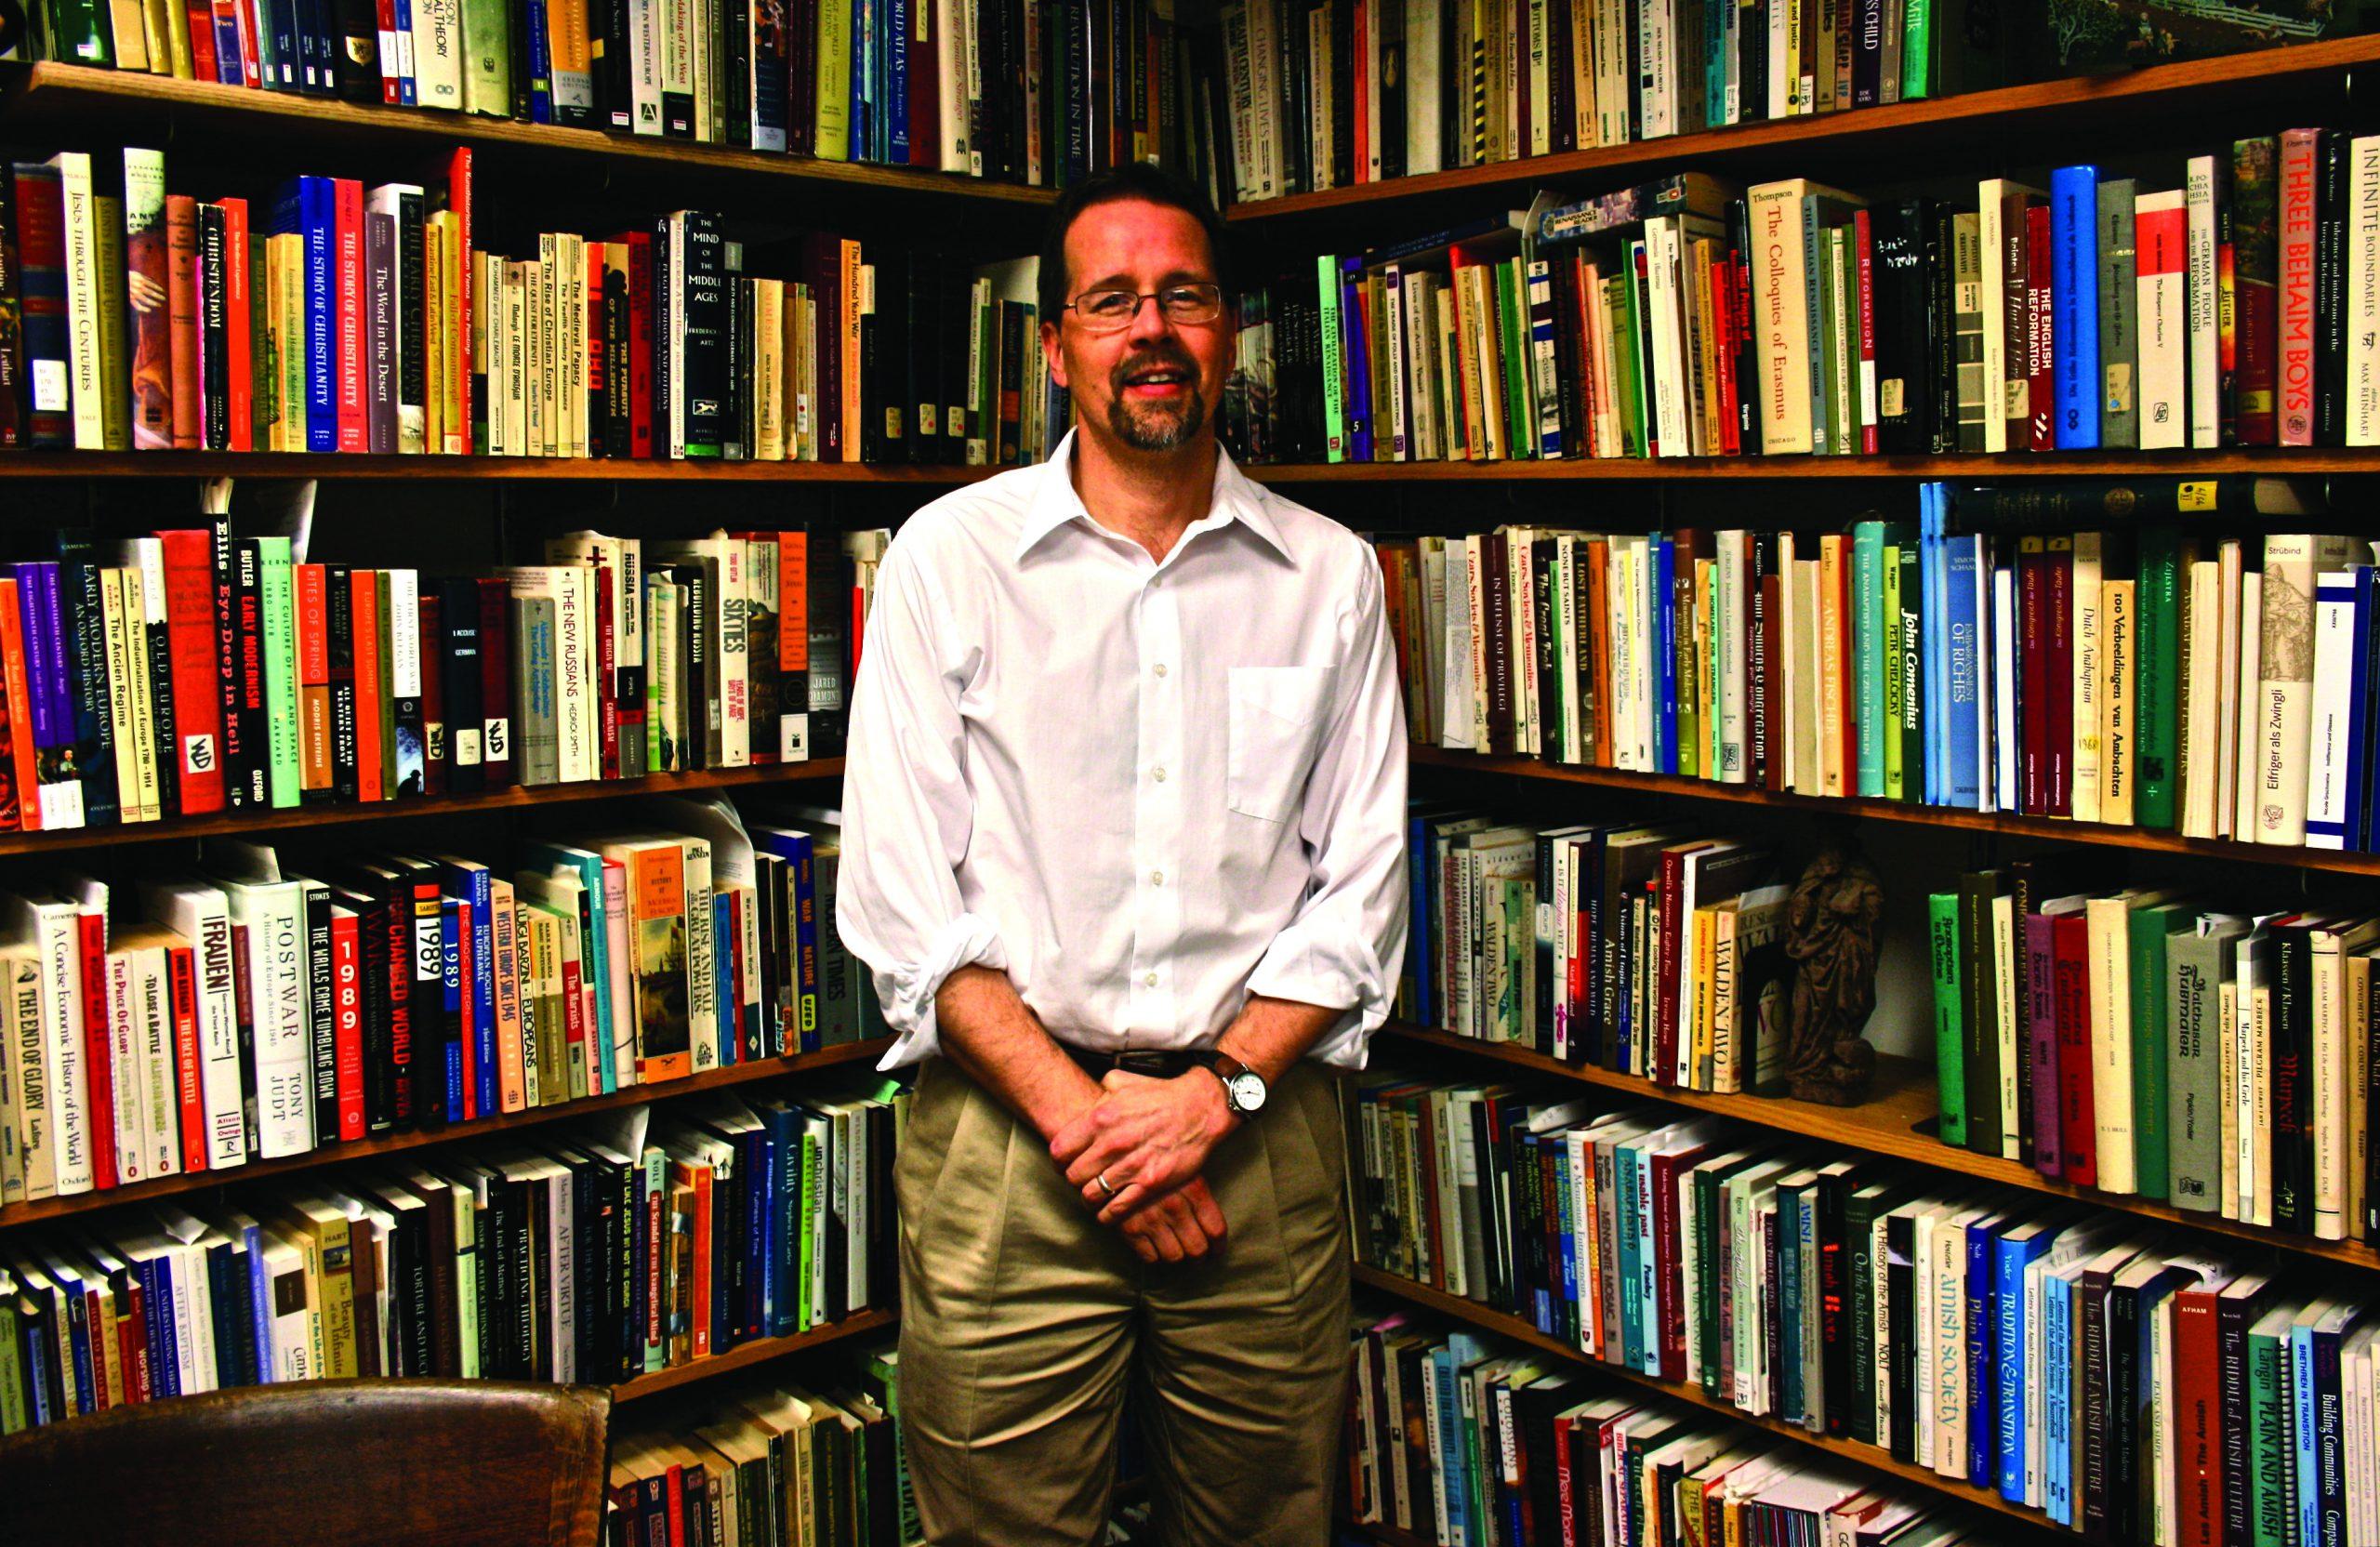 John Roth by book shelves